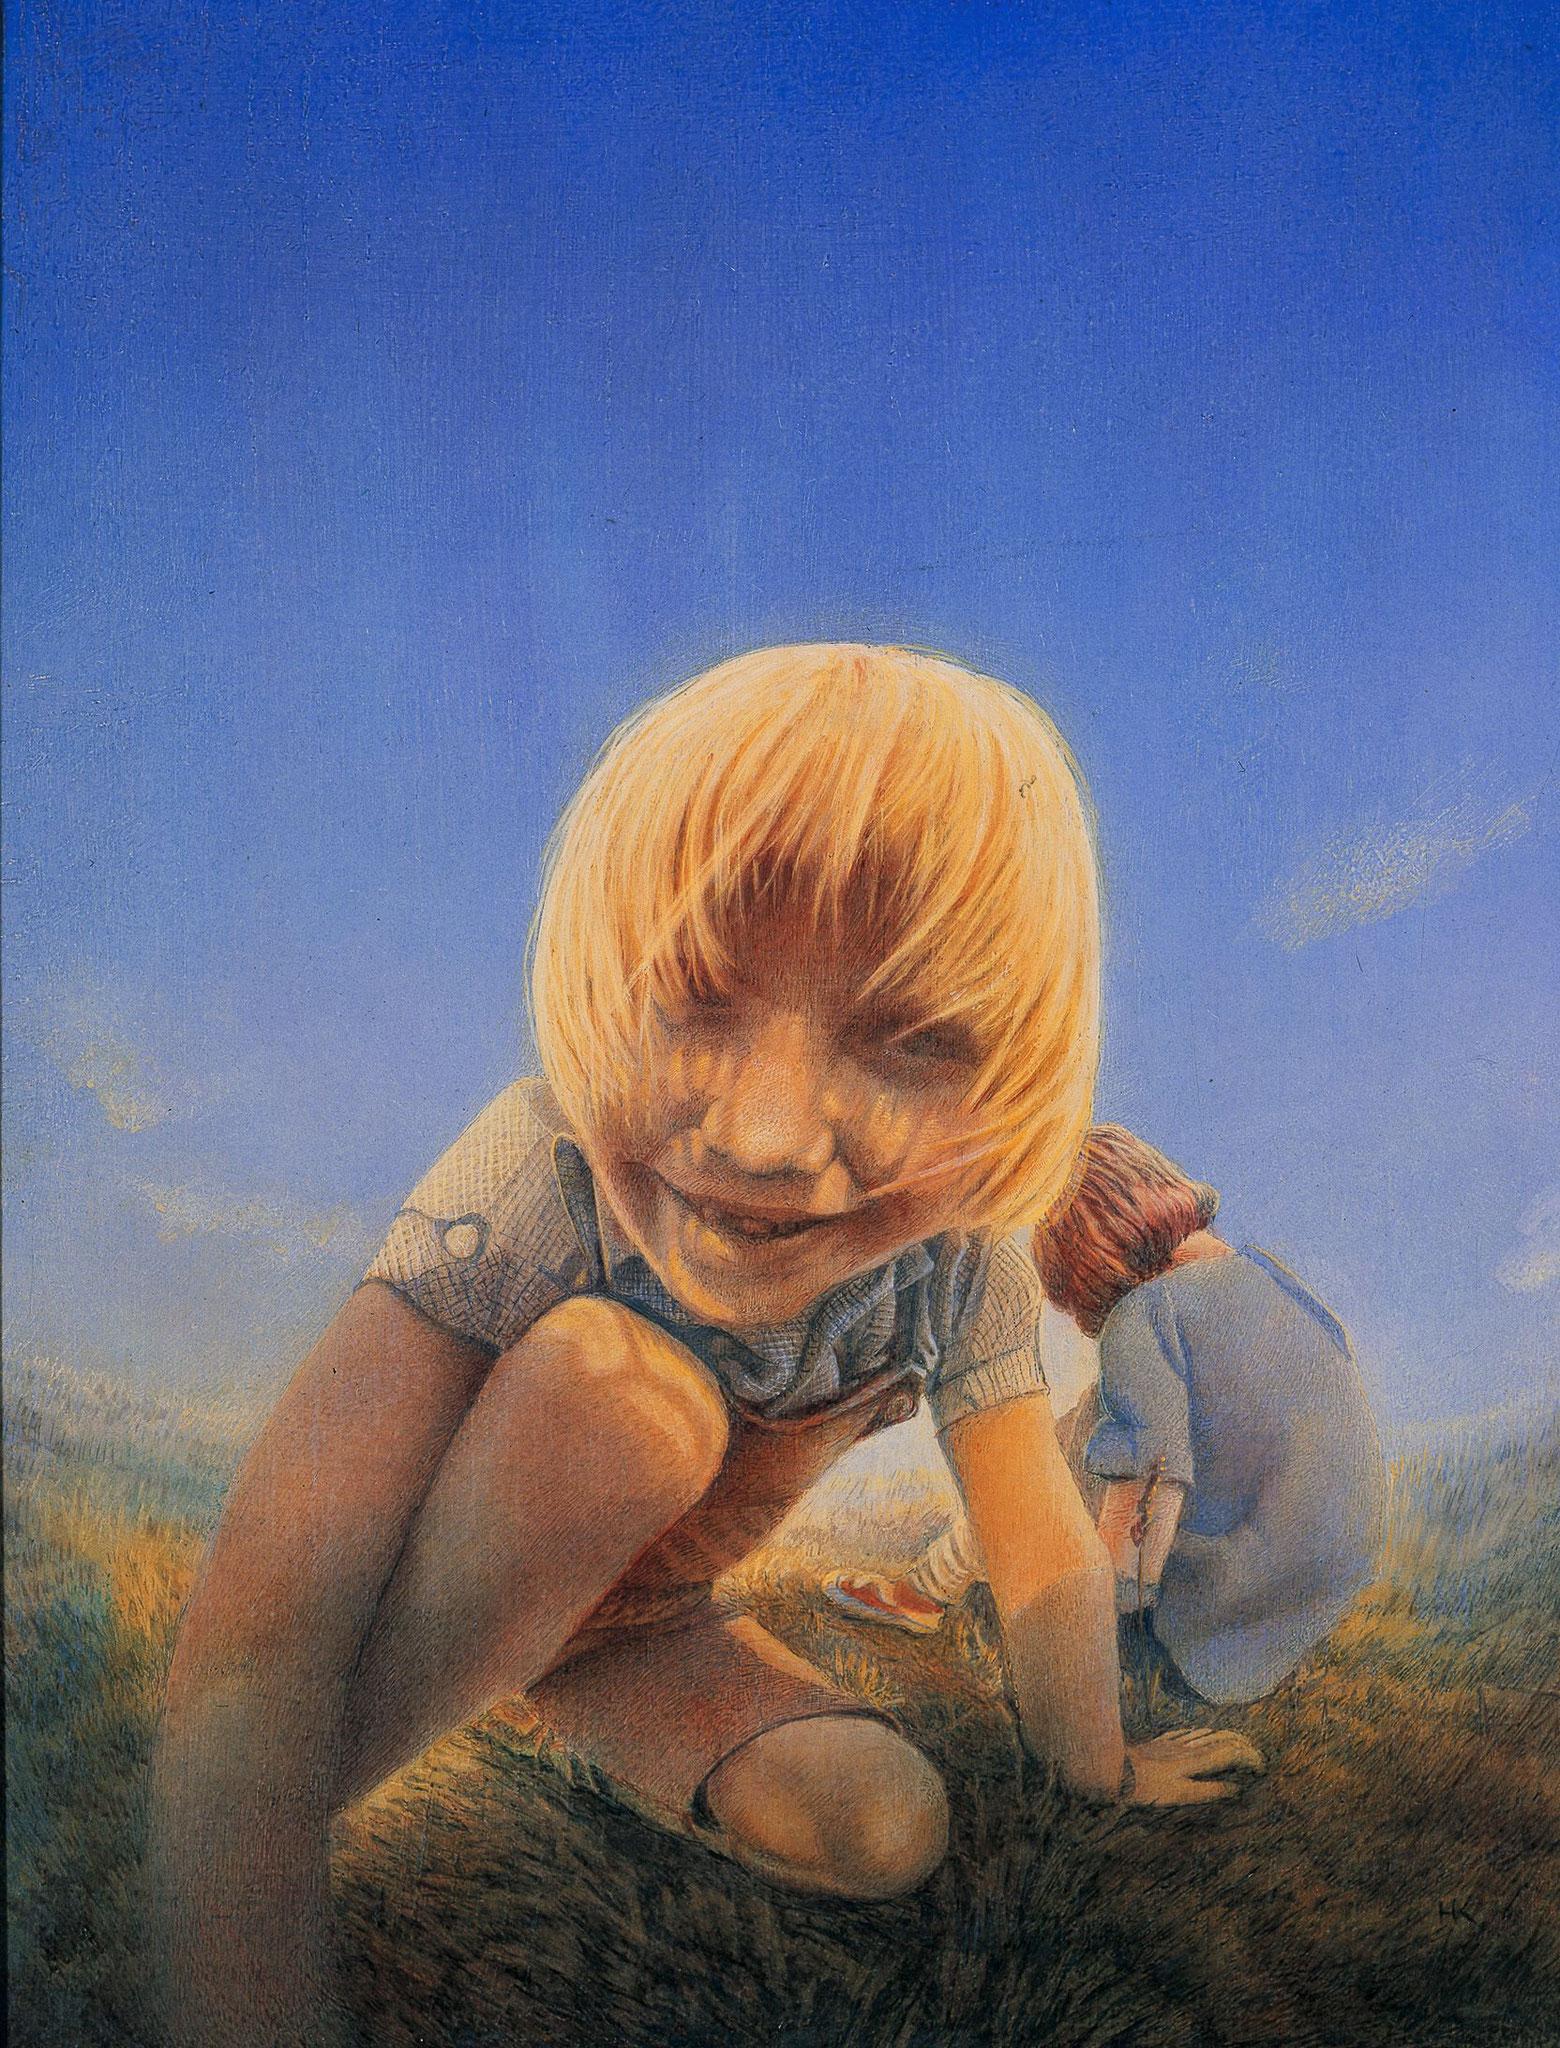 Daniel, Öl Tempera auf Holz, 30 x 24 cm, 1987